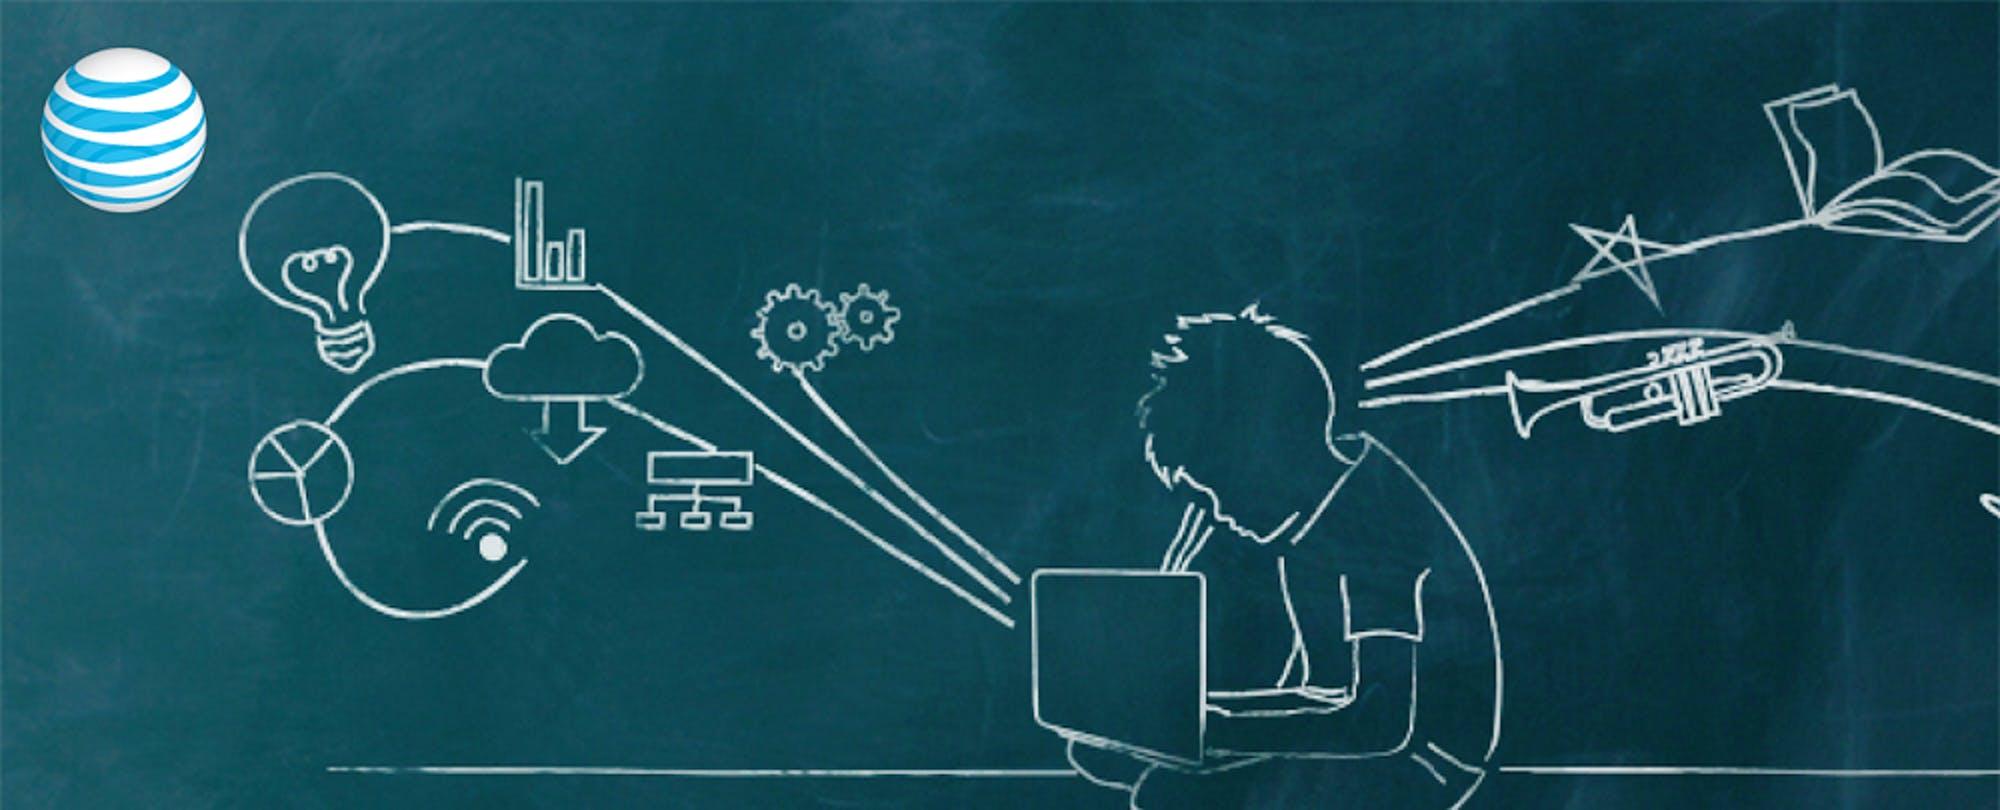 AT&T Launches Edtech Accelerator for Aspiring Entrepreneurs